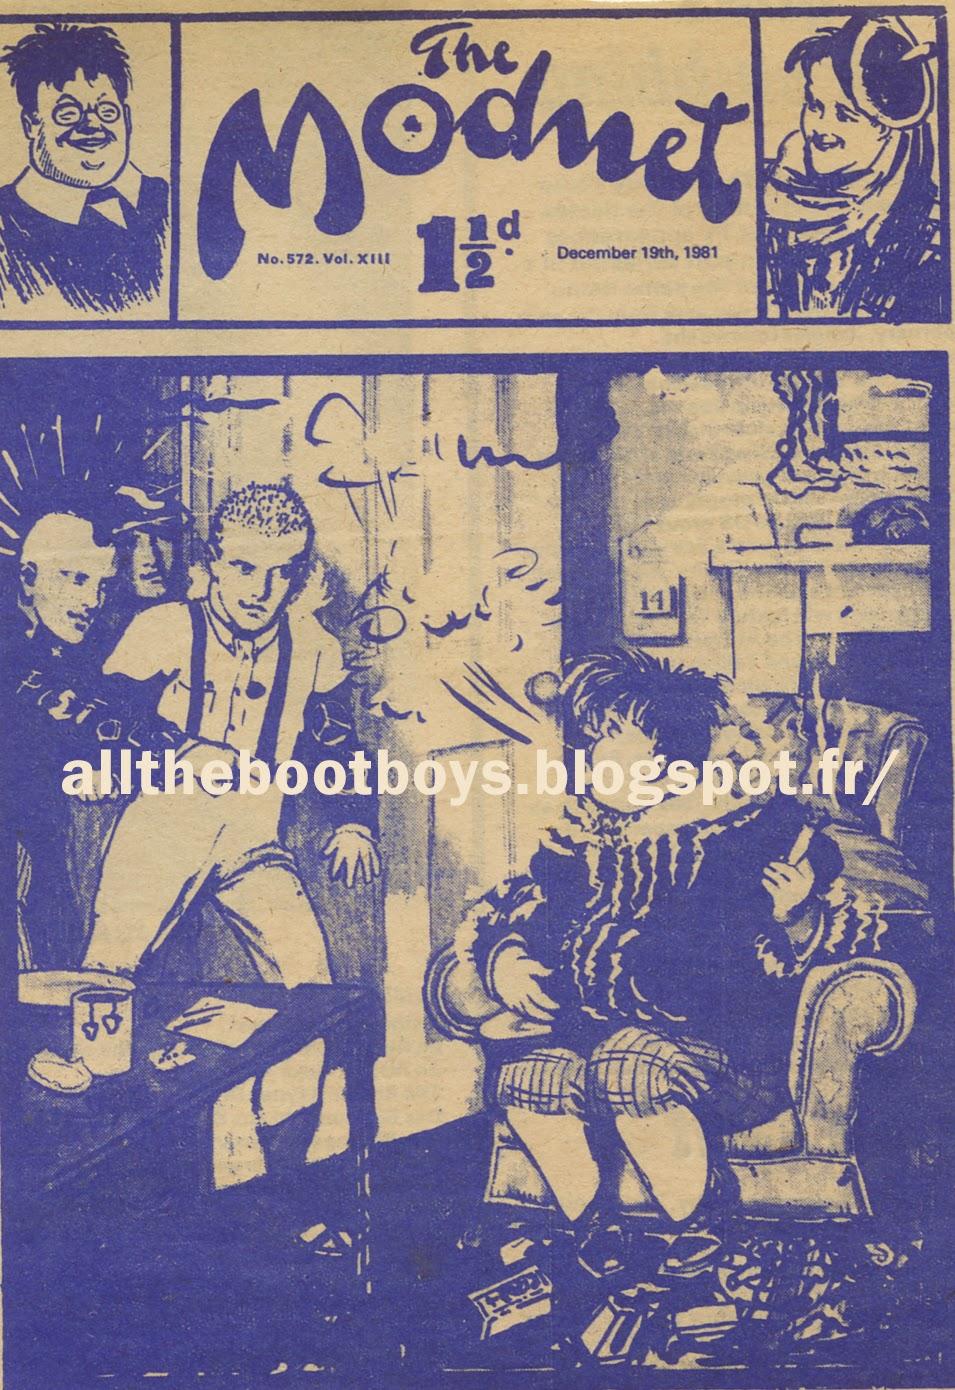 http://allthebootboys.blogspot.fr/2014/06/the-modnet-1981.html